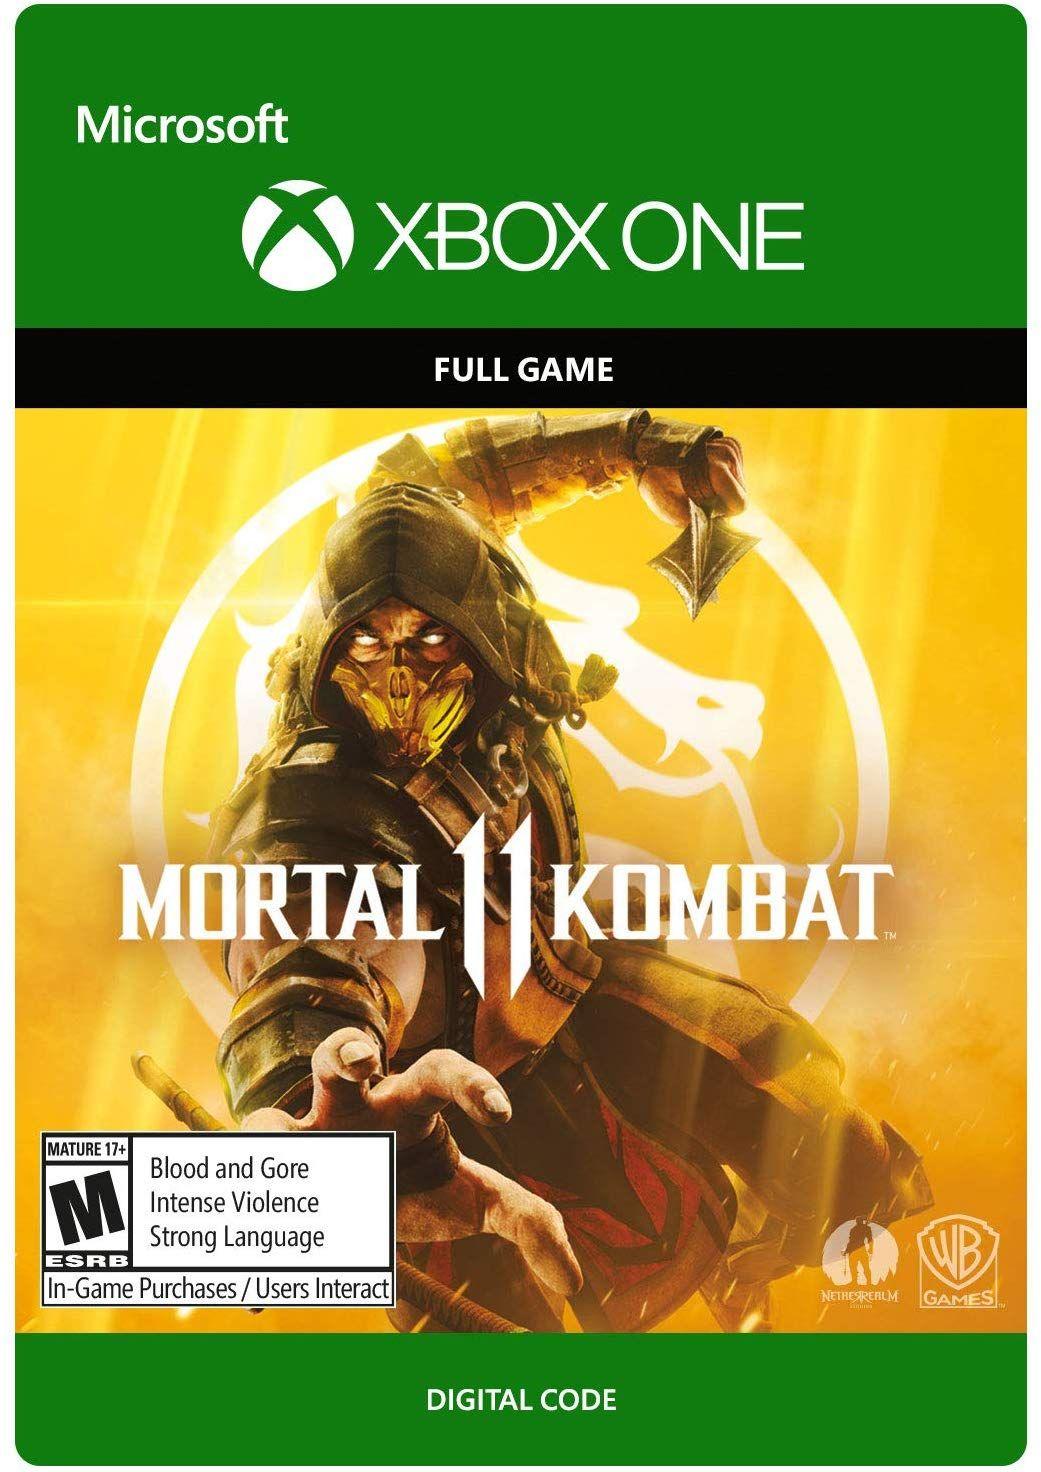 Free Mortal Kombat 11 Redeem Code Download Key Generator